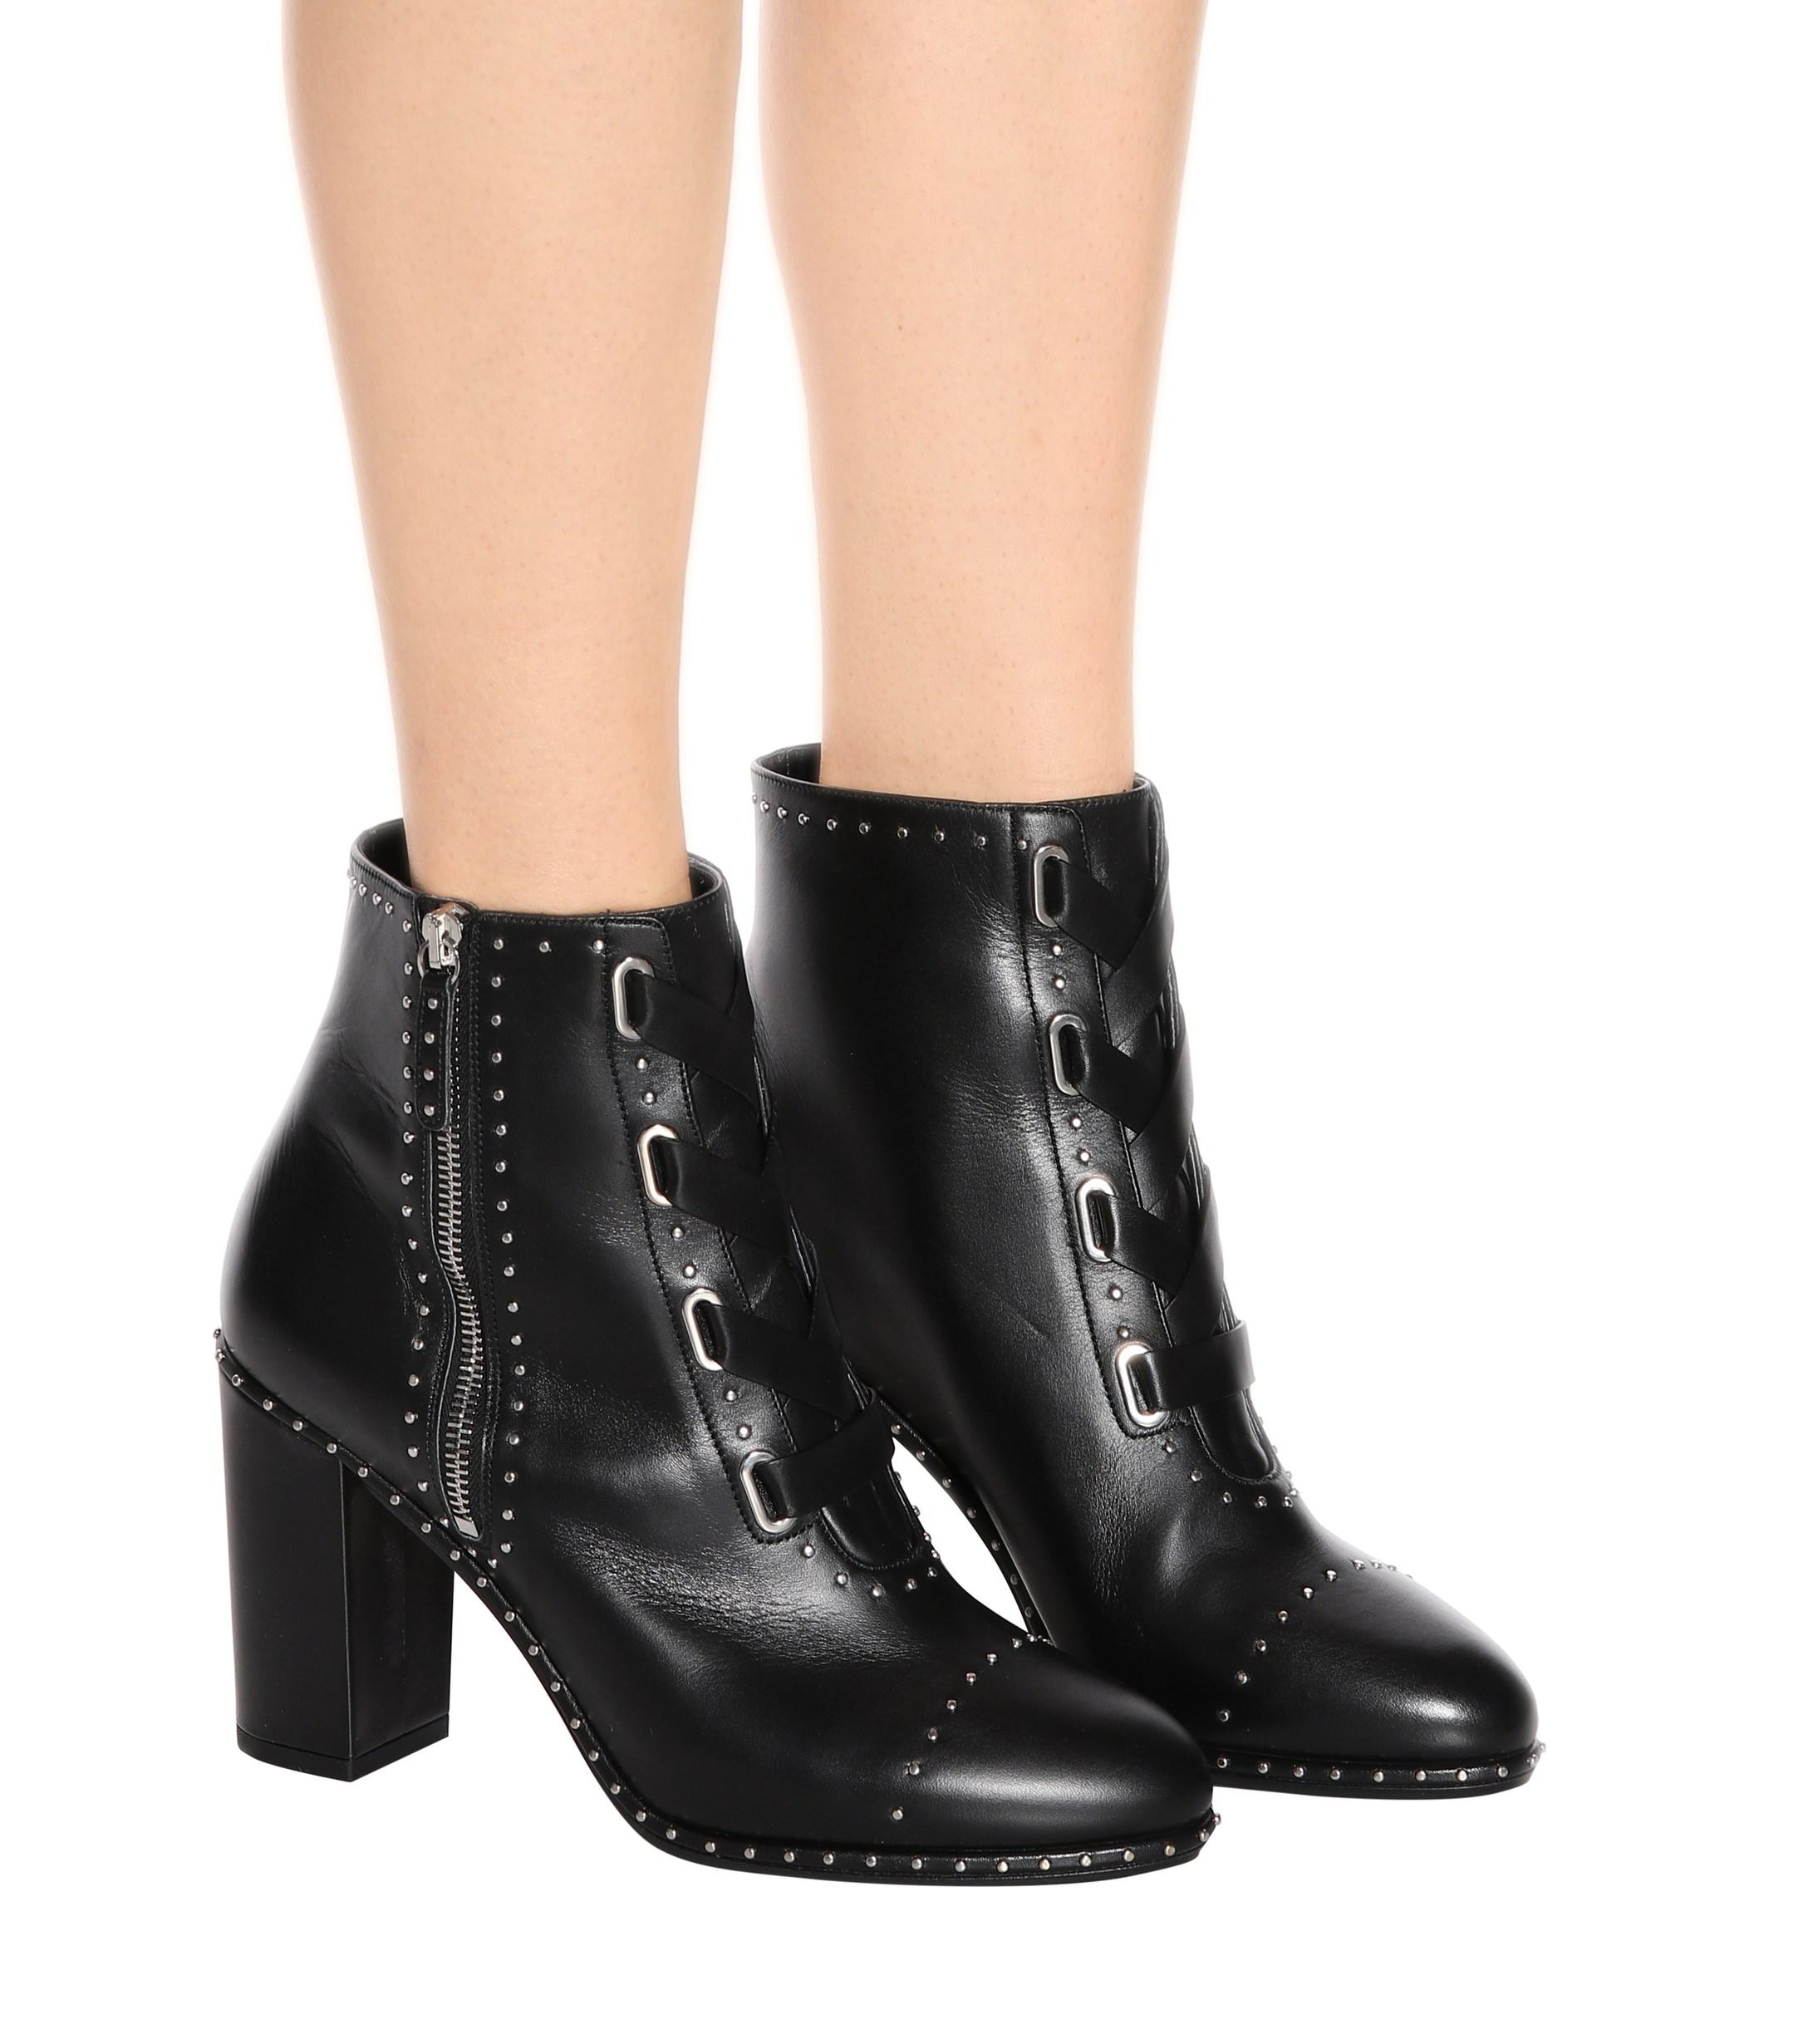 ebac5533e6bbaa ... Guns   Roses 85 Leather Ankle Boots - Lyst. View fullscreen